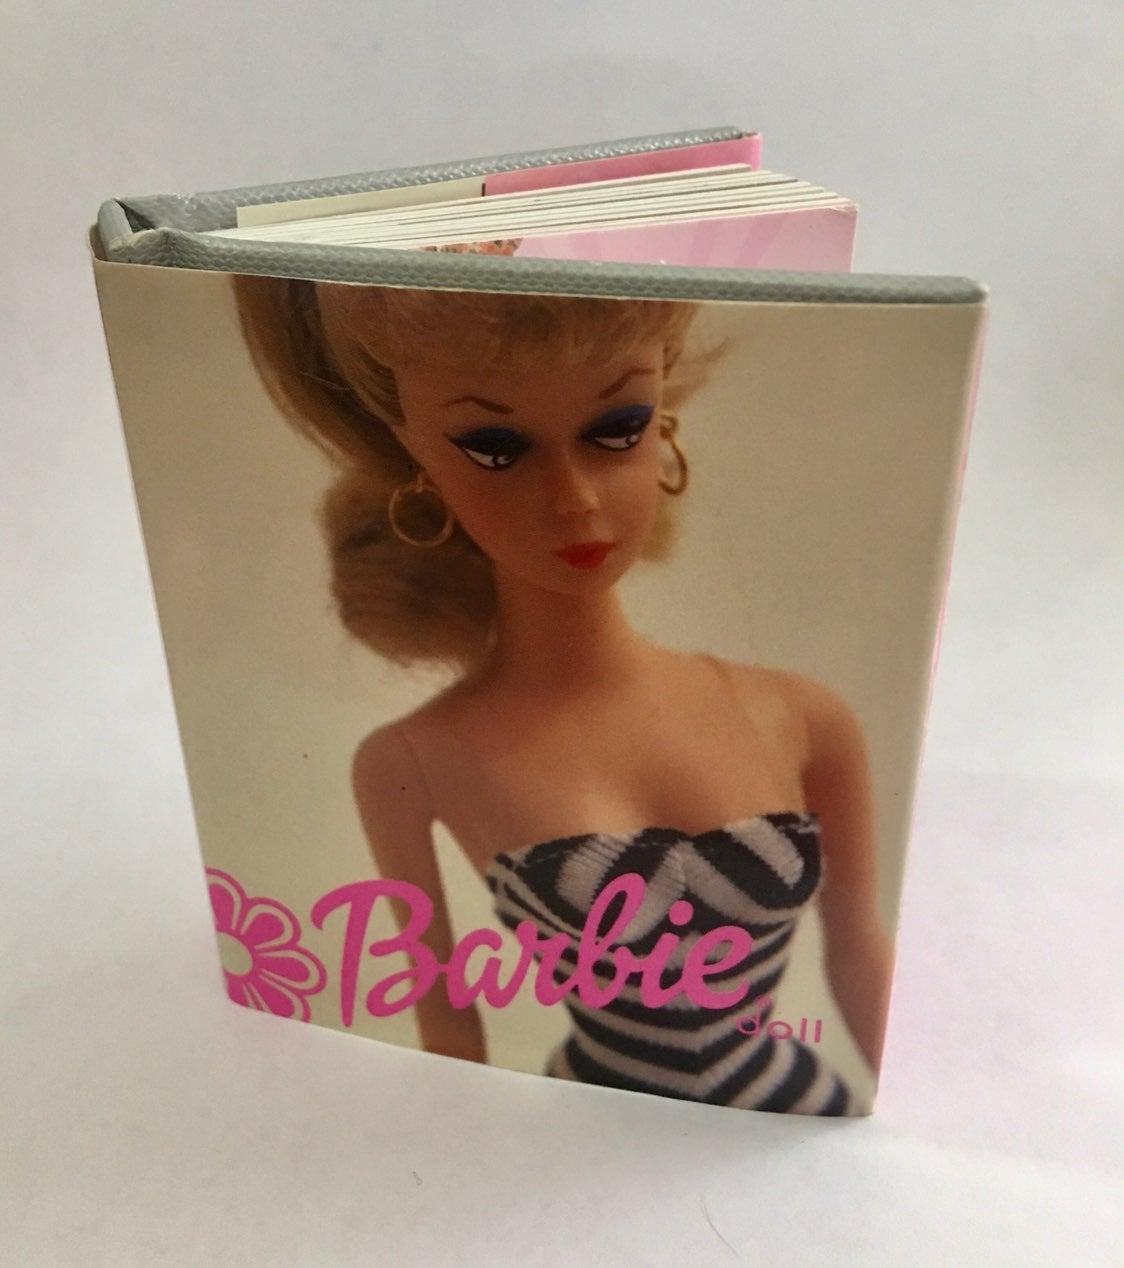 BARBIE DOLL mini book by Keni Valenti